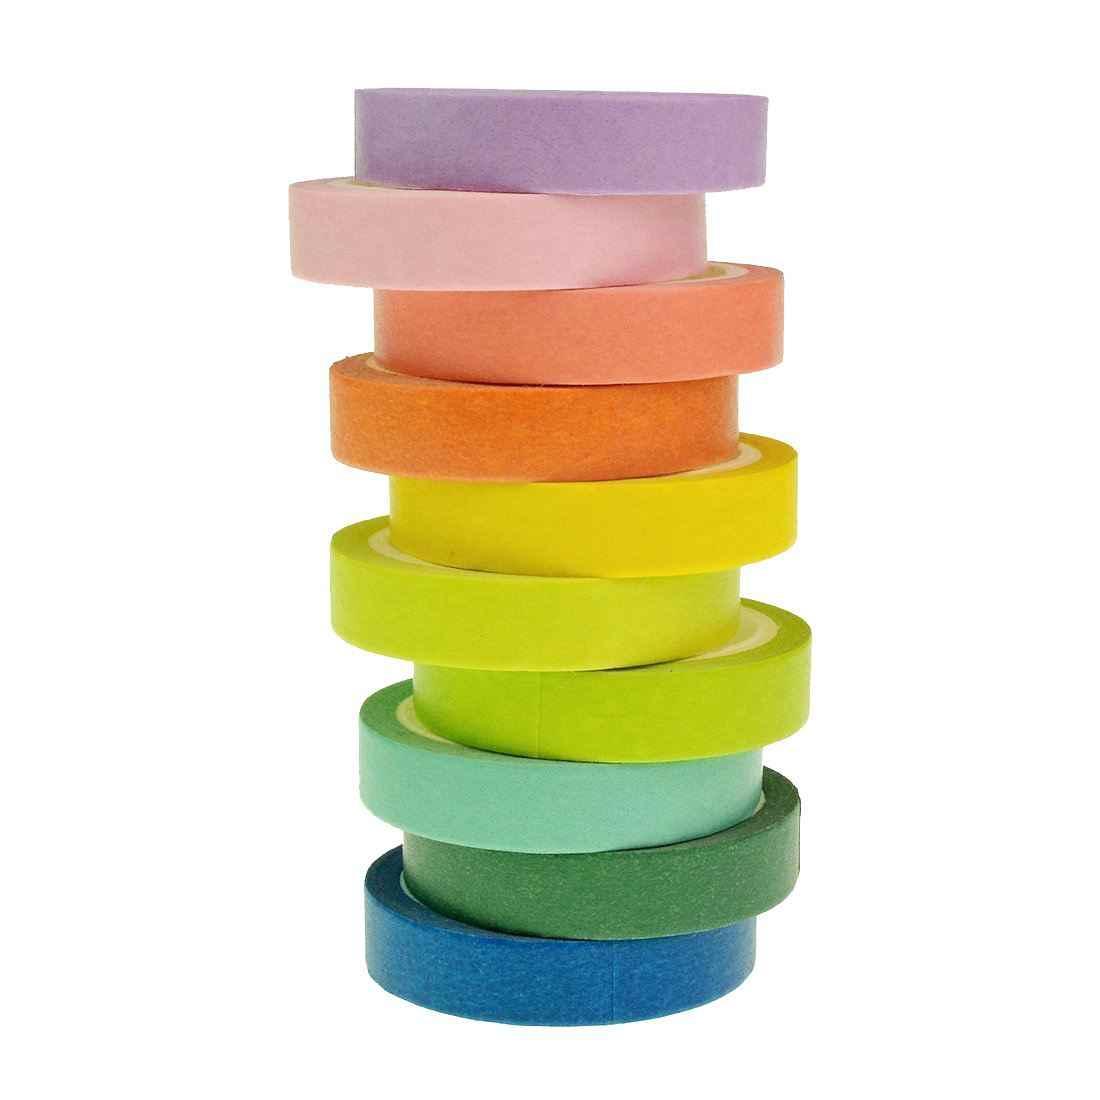 AAAJ-лента набор 10x декоративная Радужная липкая бумага Маскировочная Клейкая Лента Скрапбукинг DIY